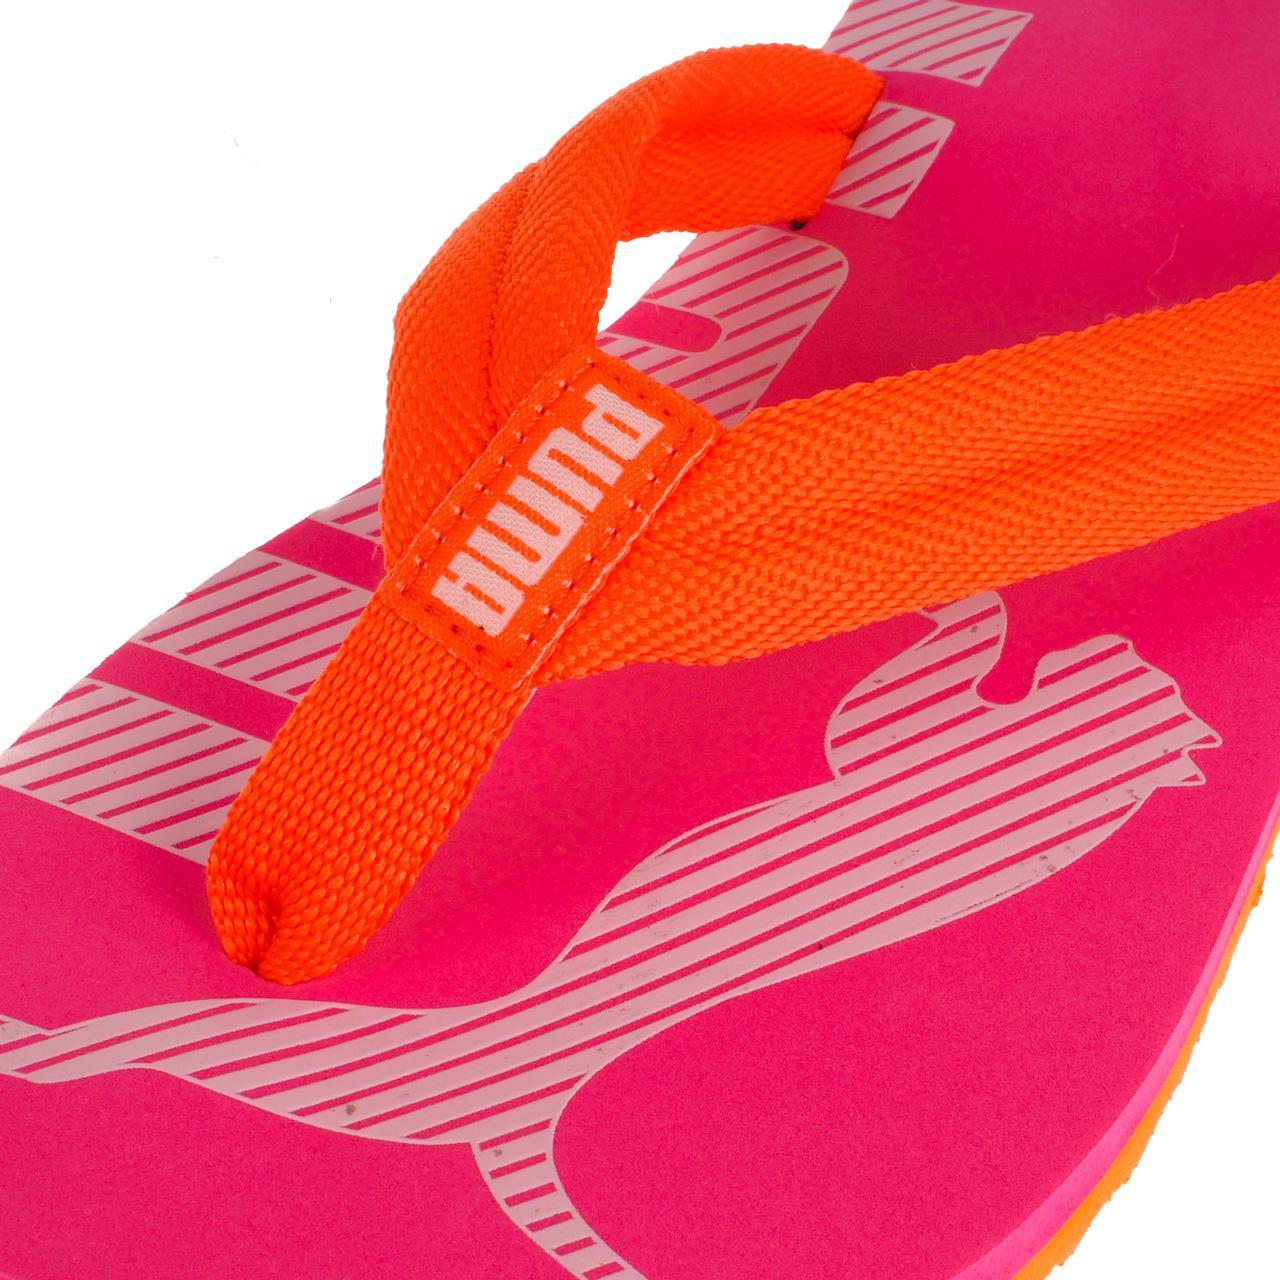 Latschen-Flip-Flops-Puma-Epic-Flip-v2-Rosa-Flip-Flops-Jr-Rosa-17067-Neu Indexbild 2